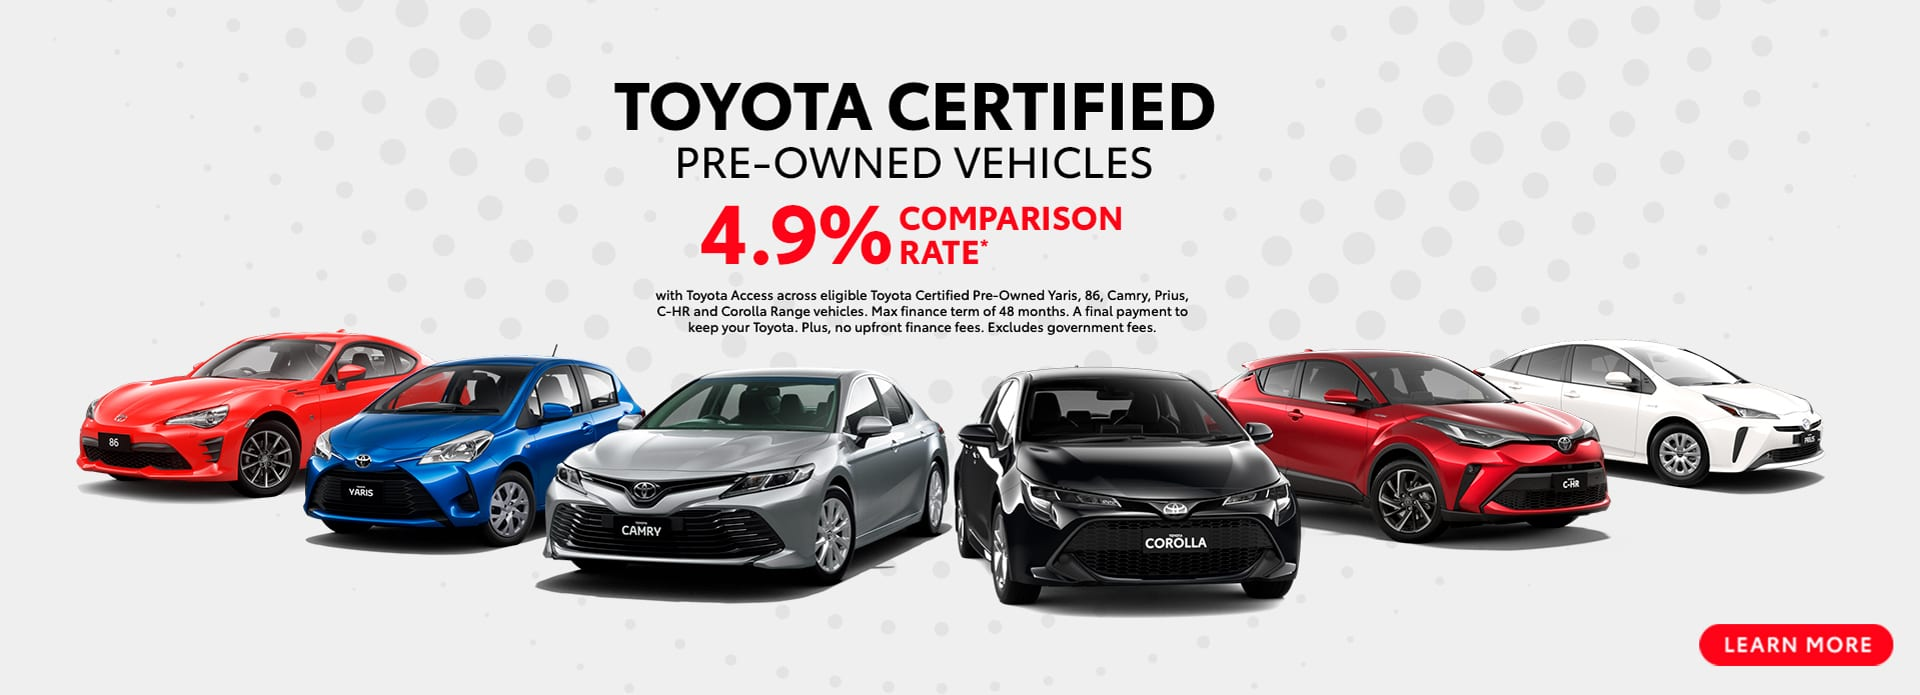 Certified-Cars-Web-Banner-Desktop-Toyota